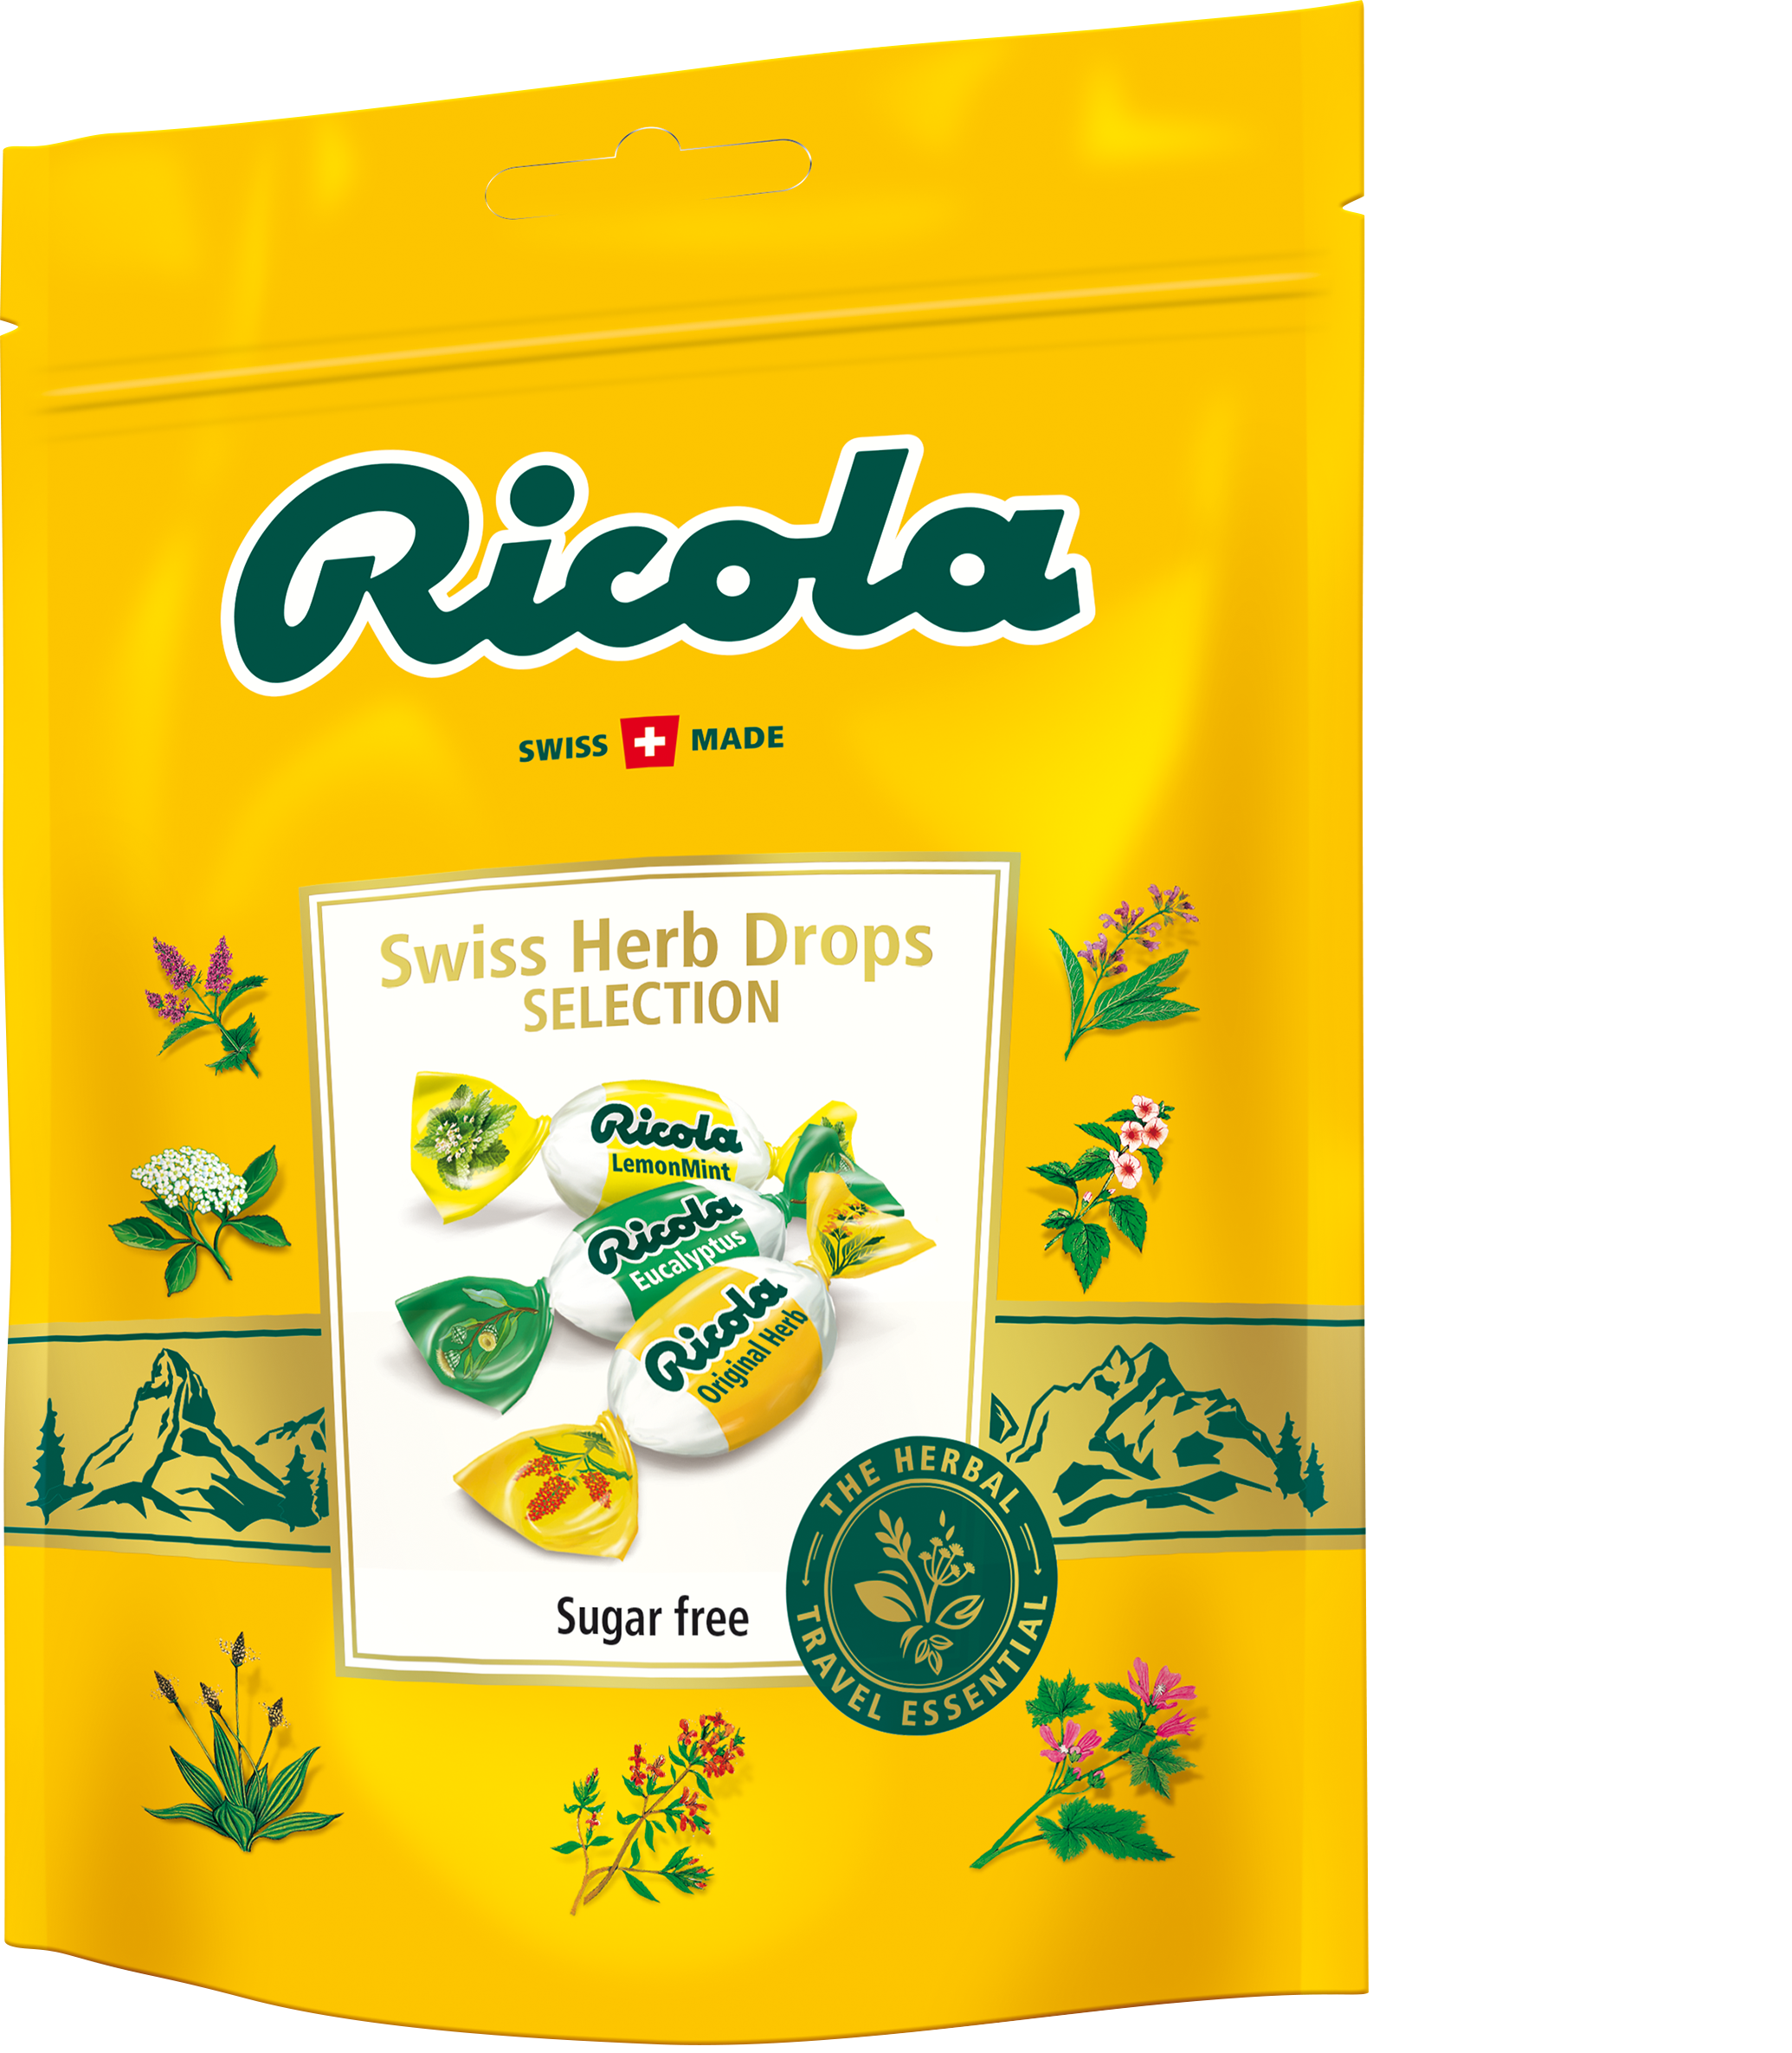 Ricola To Highlight New Packs At Tfwa Singapore Show